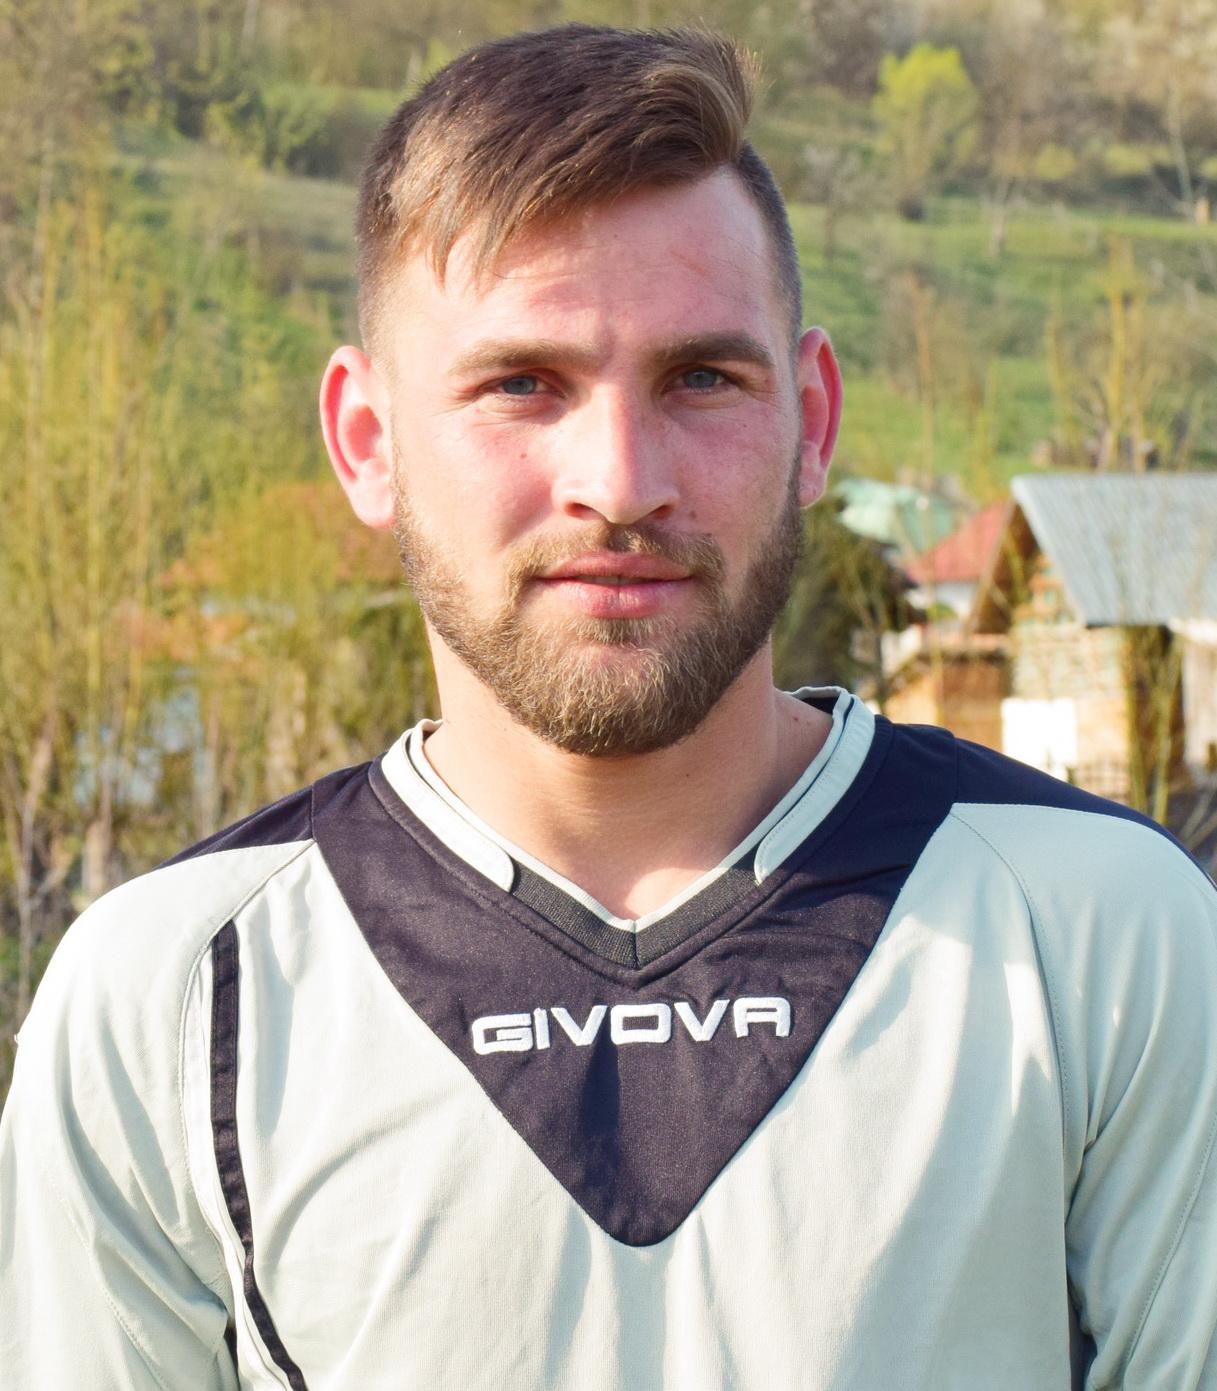 Sarghe Alexandru - Valentin